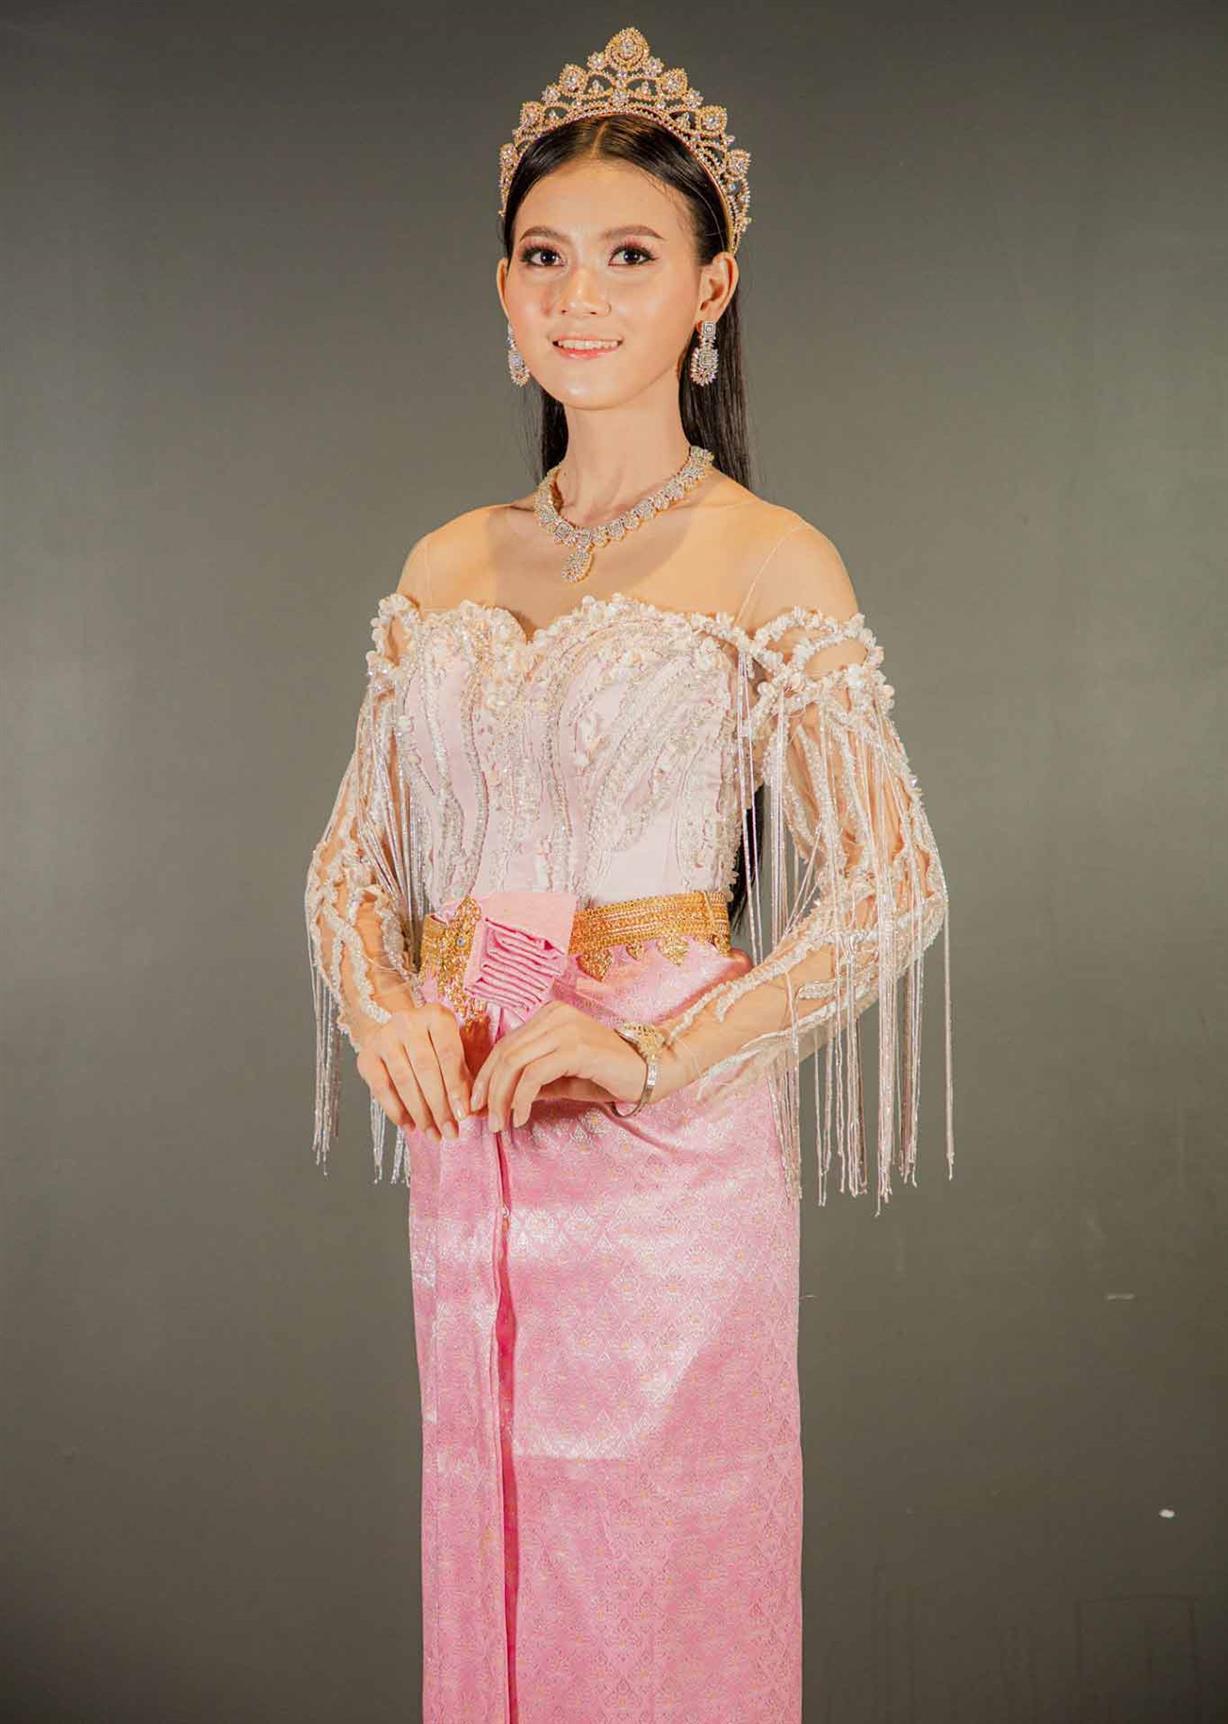 Miss Grand Khmer-Australia 2020 Ngim Sreylis